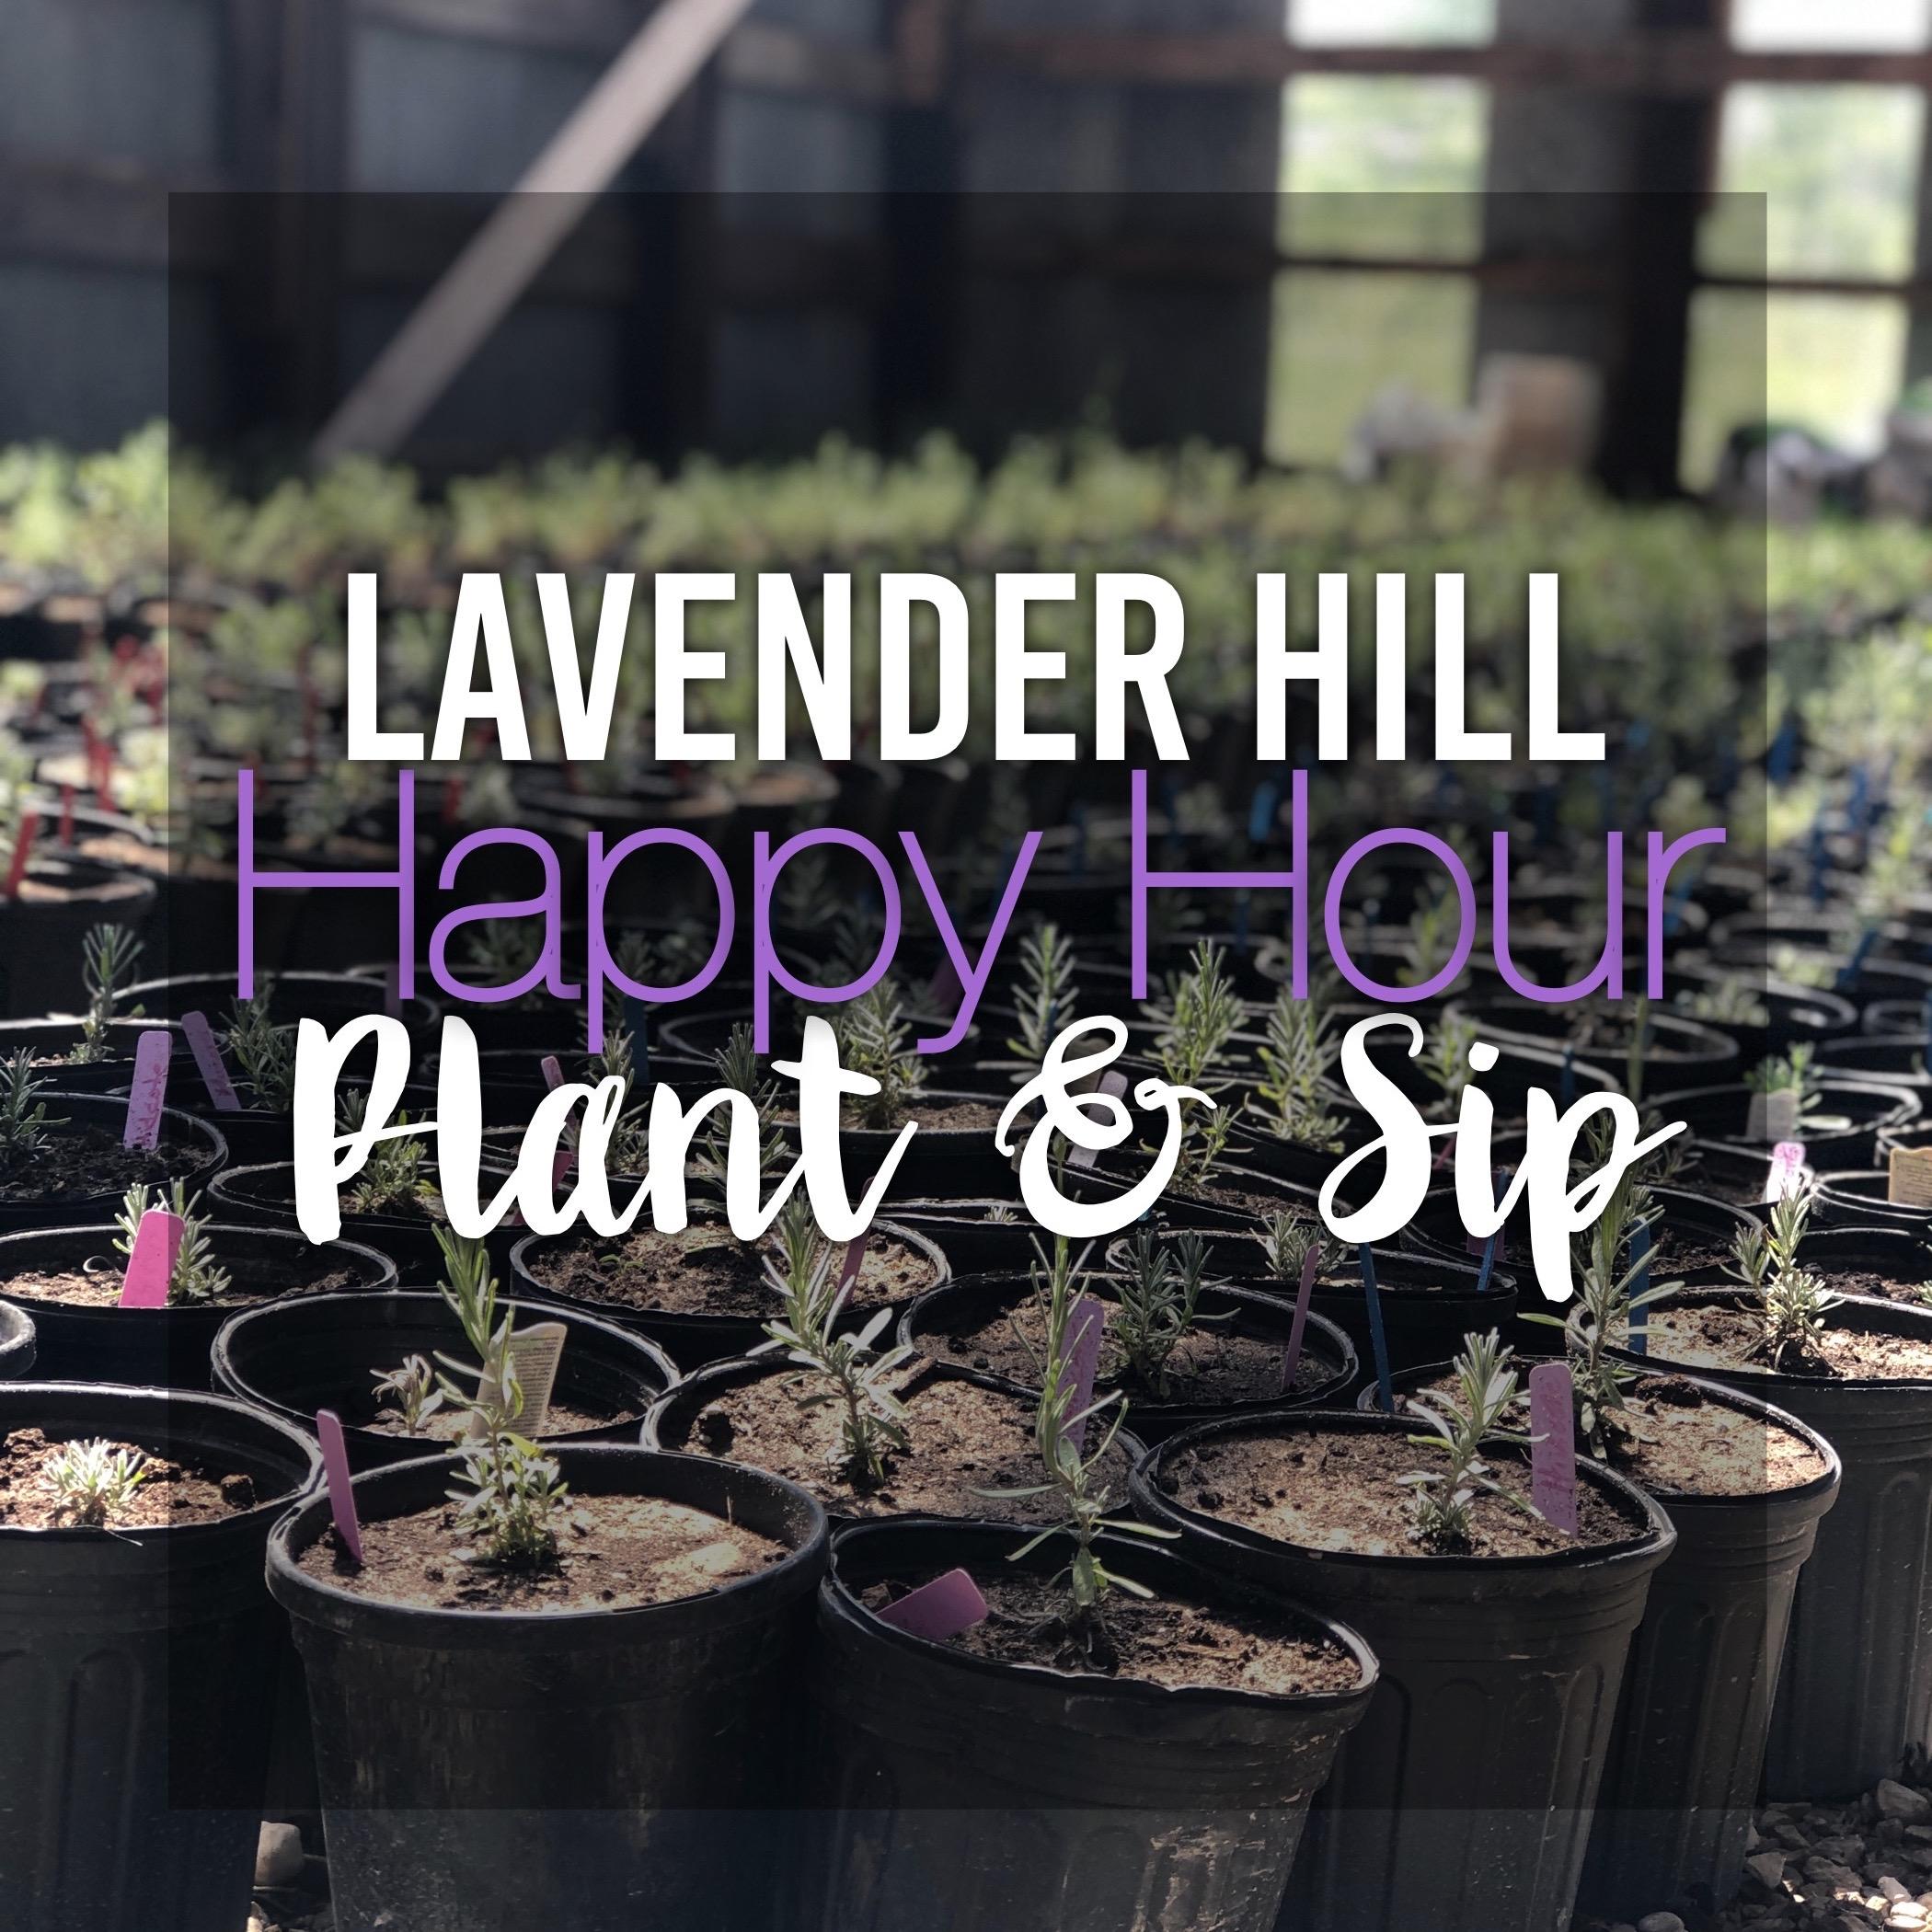 Lavender Hill Happy Hour Plant & Sip Workshop